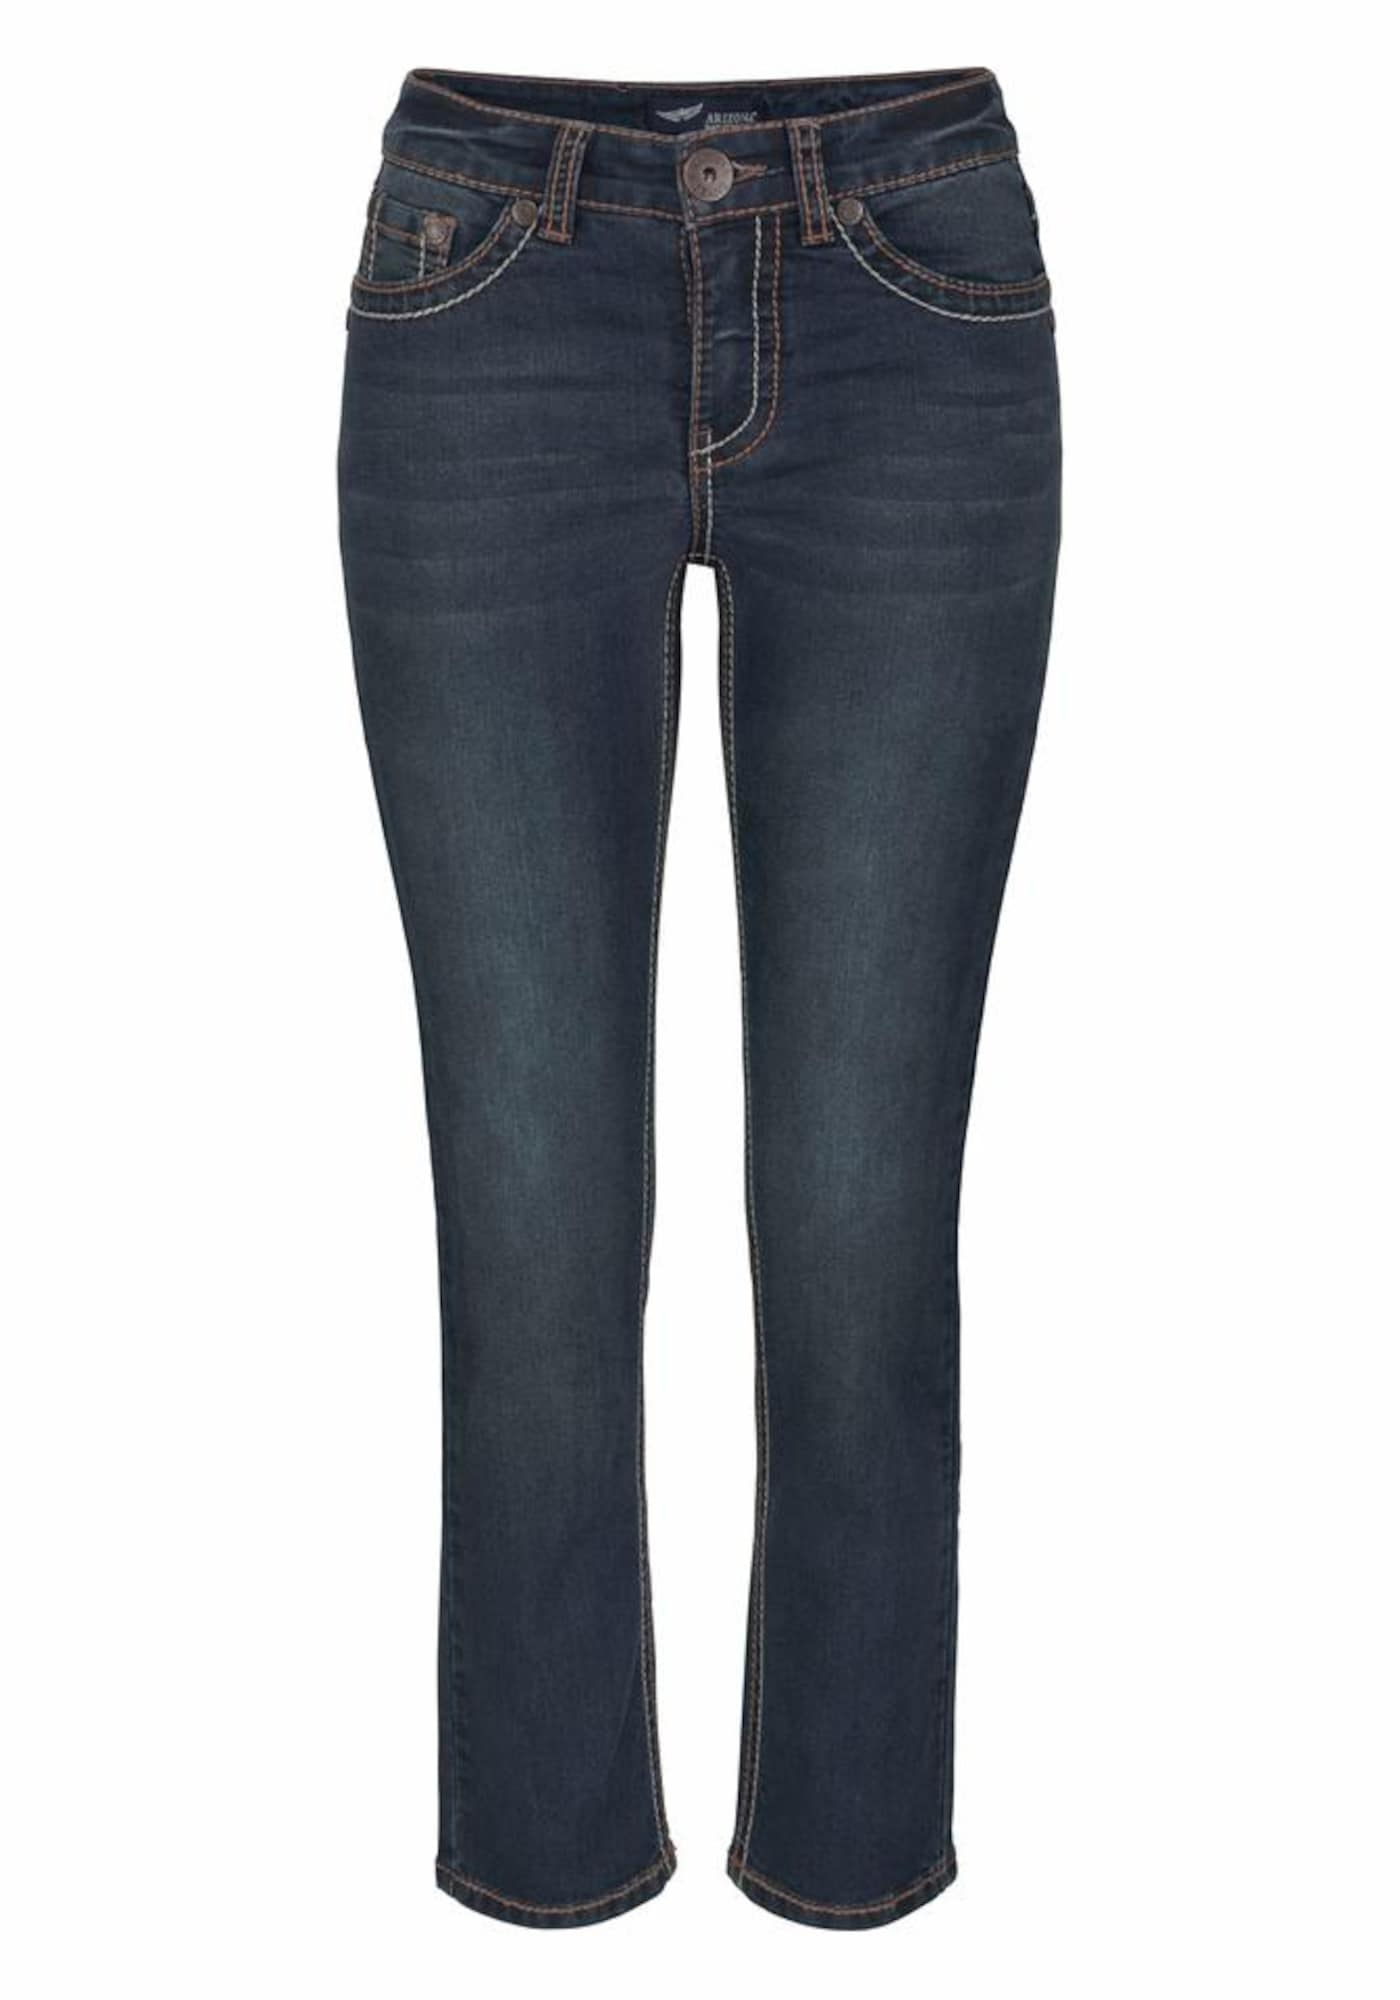 7/8-Jeans »mit Kontrastnähten« | Bekleidung > Jeans > 7/8-Jeans | Dunkelblau | ARIZONA